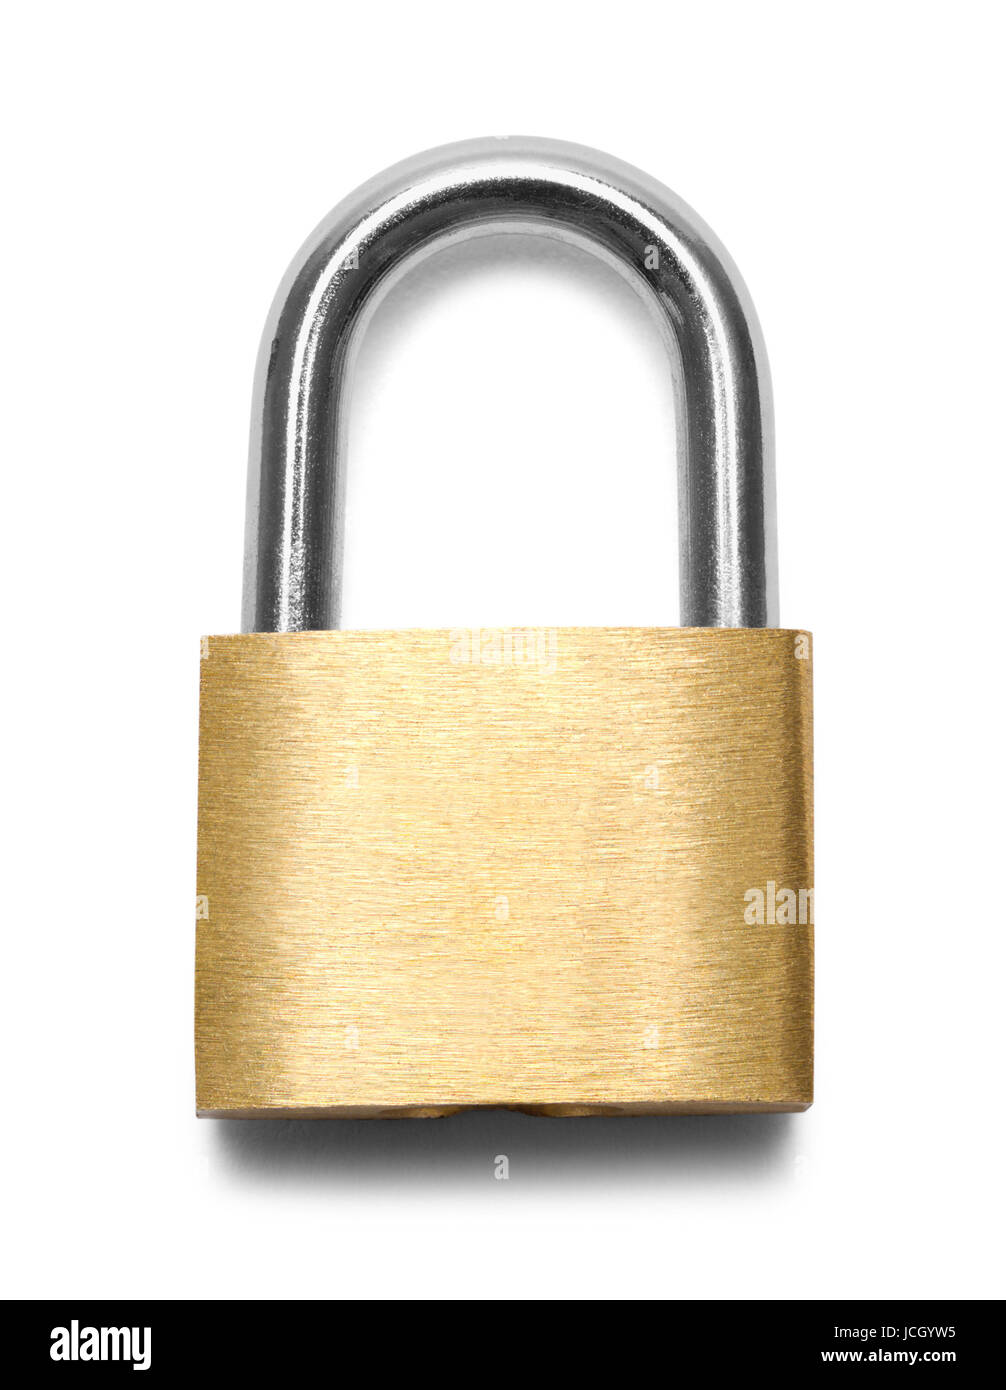 Closed Brass Padlock Isolated on White Background. - Stock Image